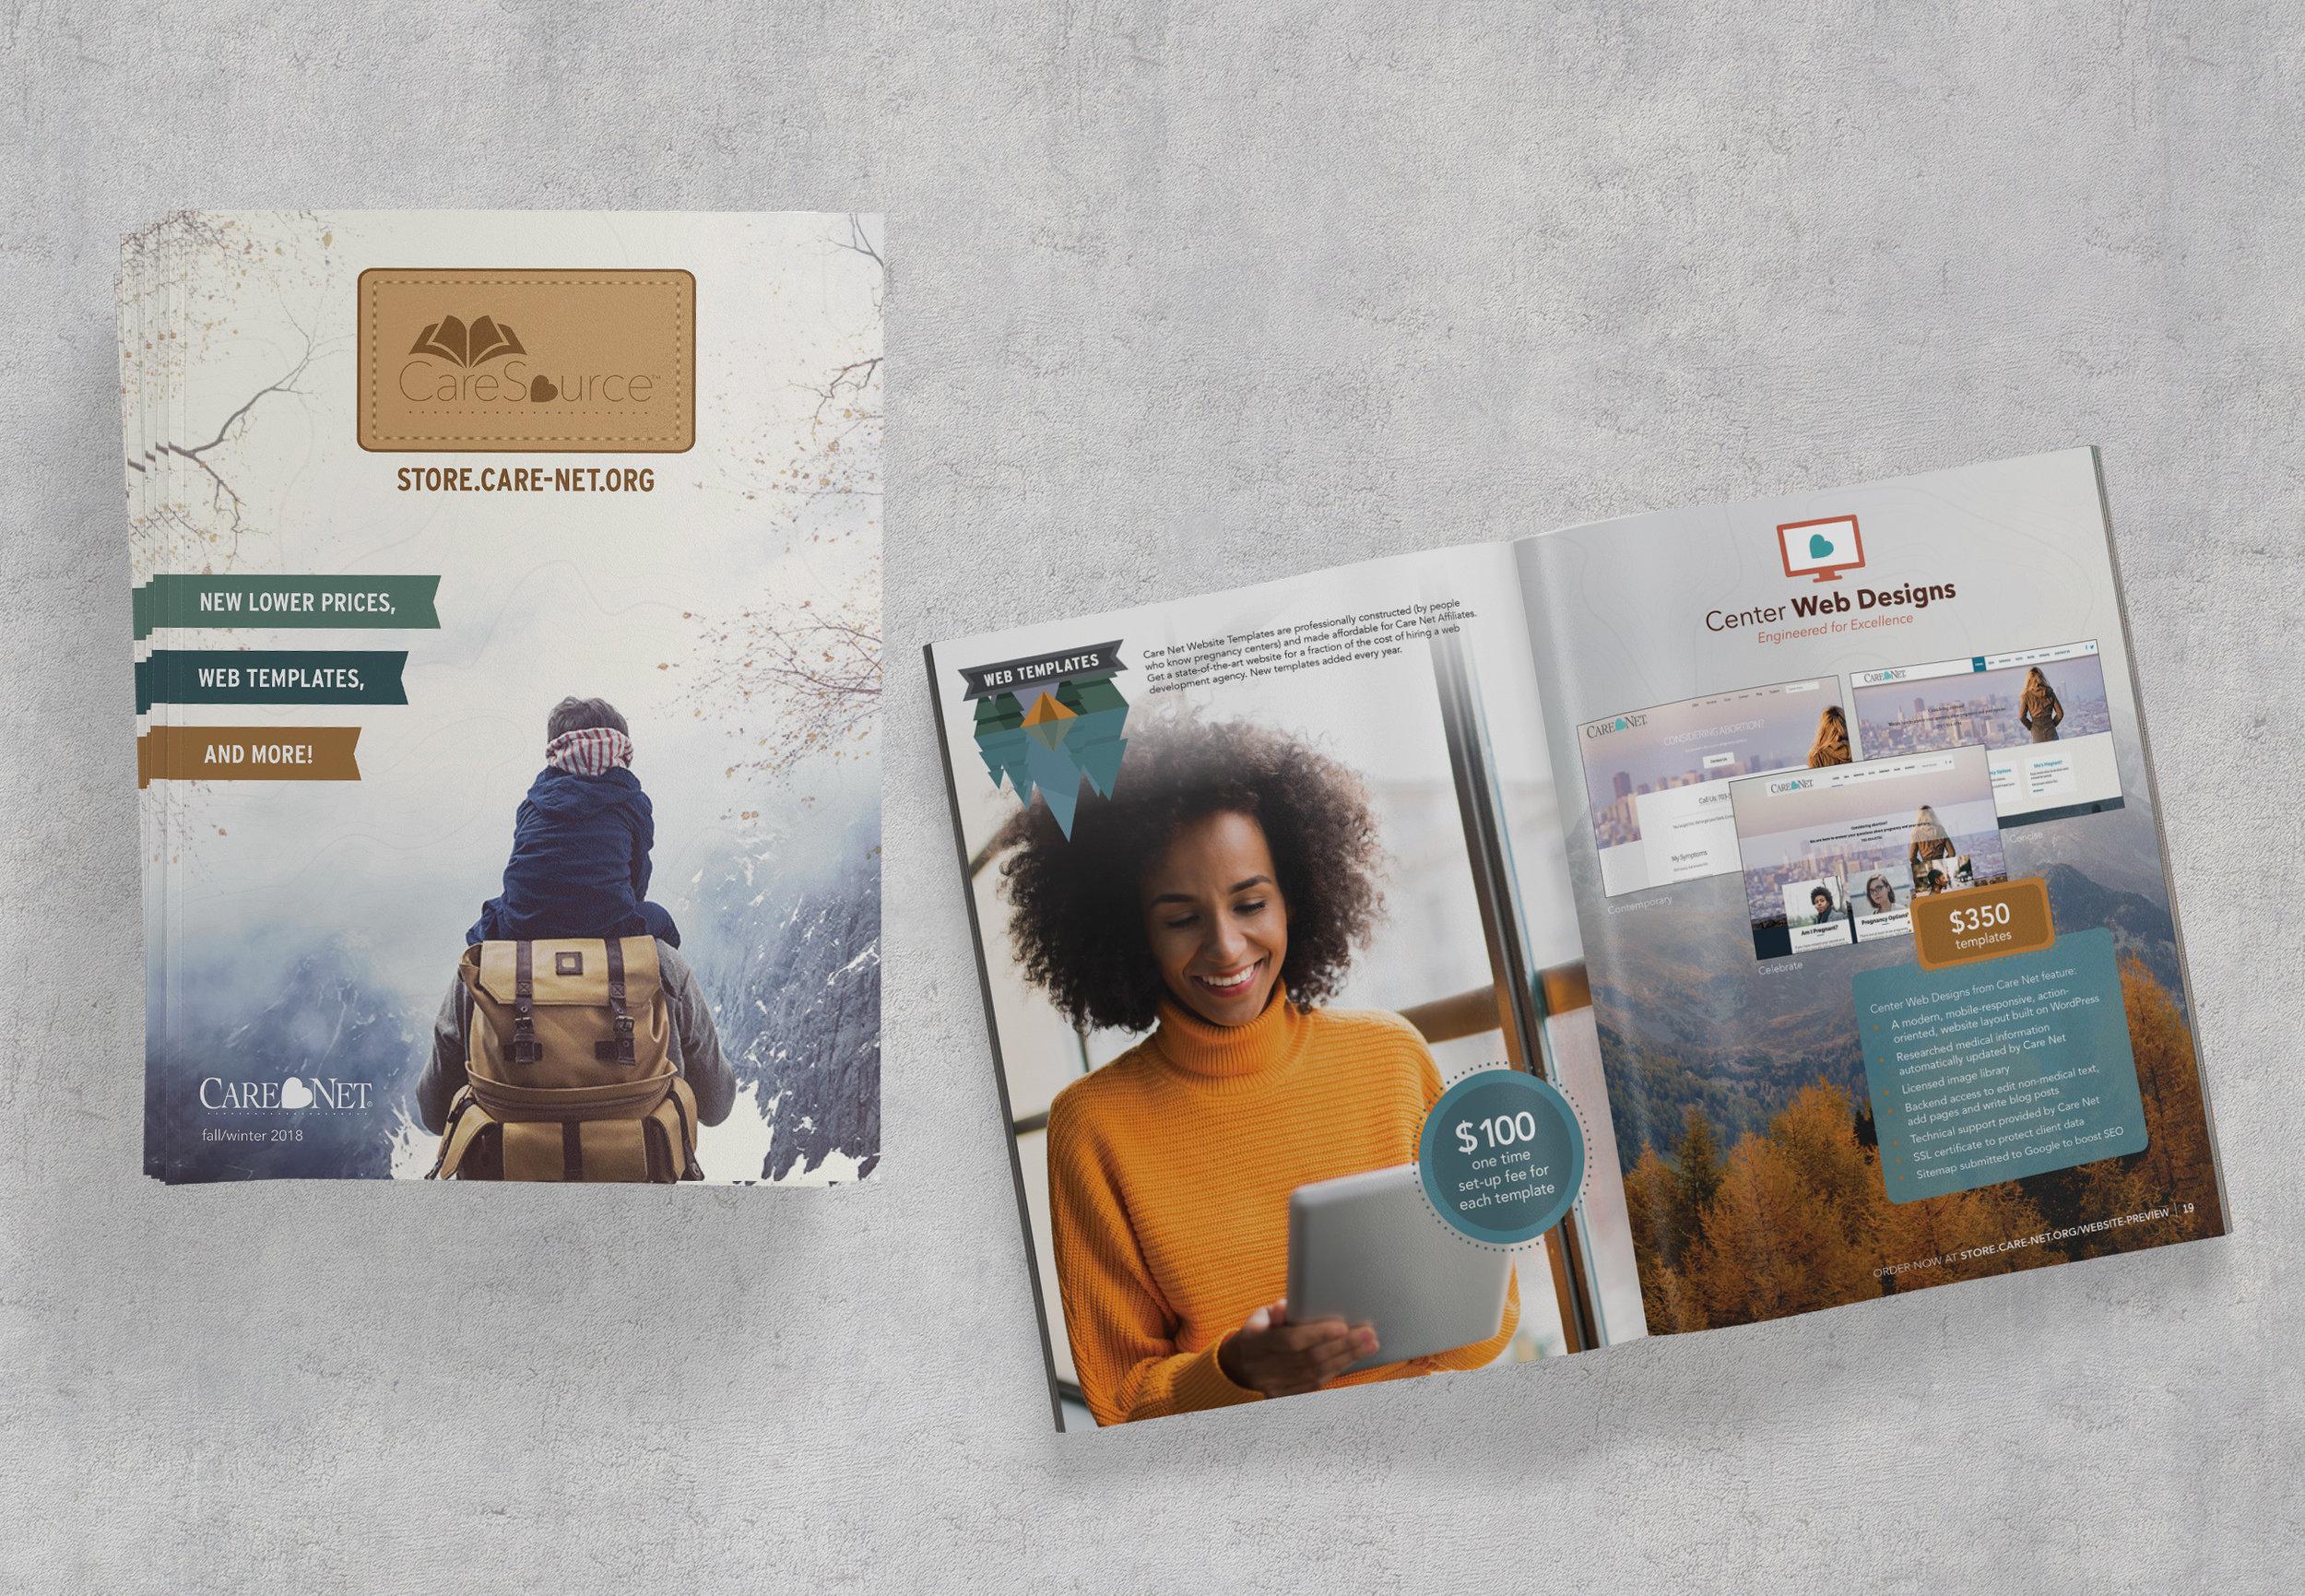 Care Net CareSource Fall/Winter 2018 Catalog